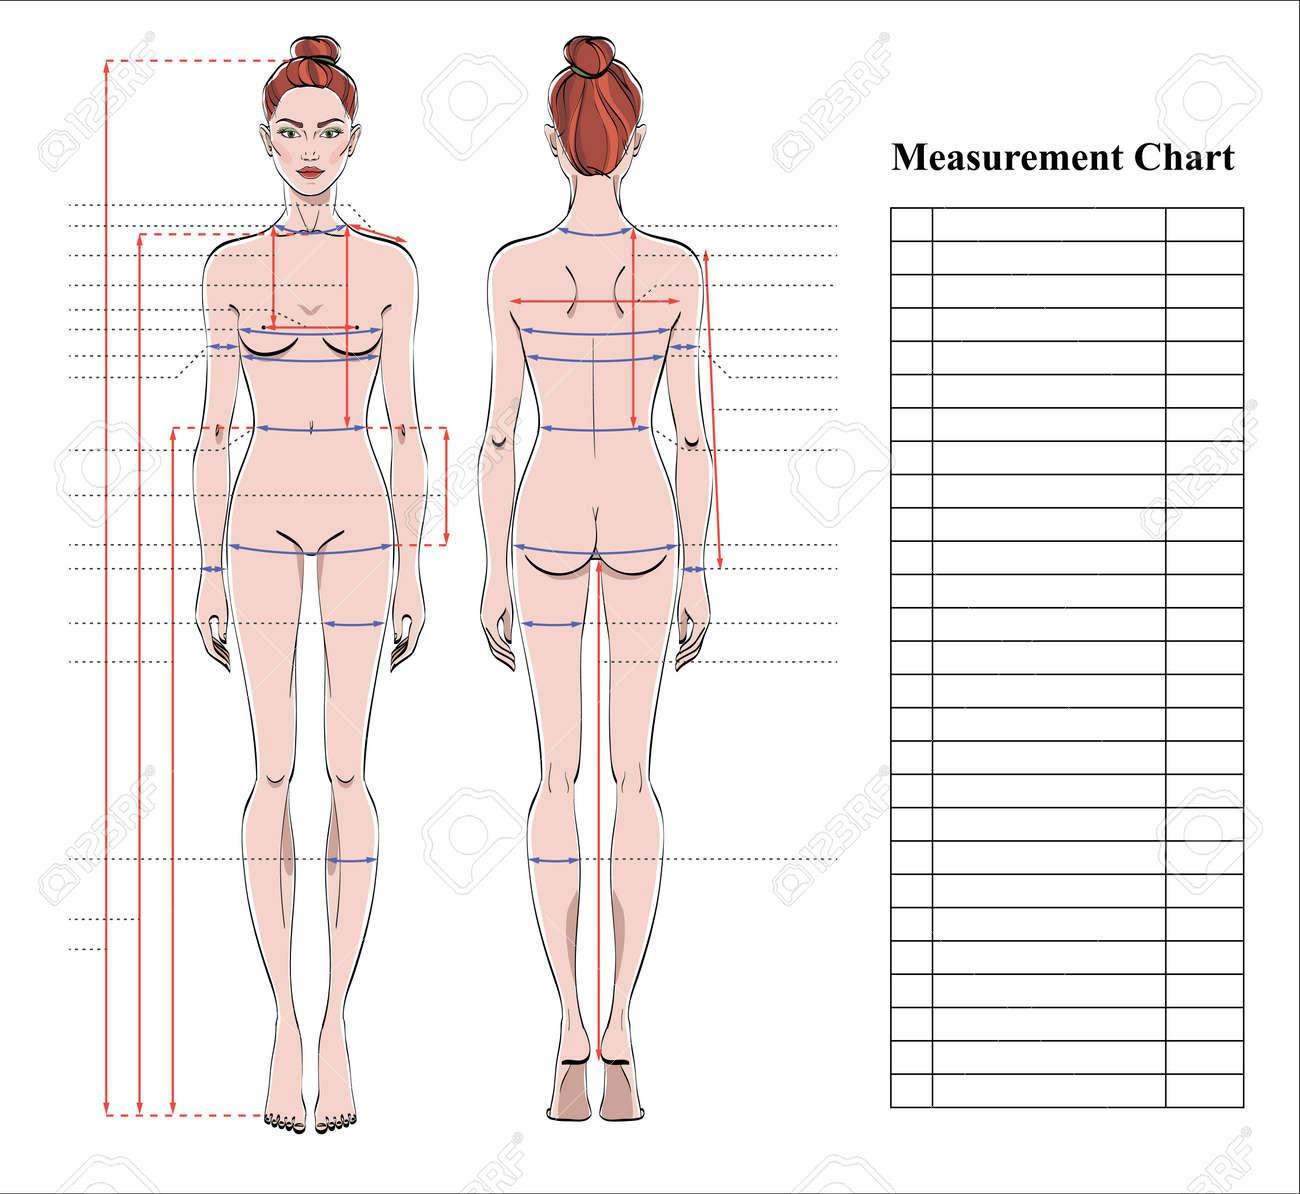 hight resolution of diagram of female back wiring diagram diagram of female back diagram of female back